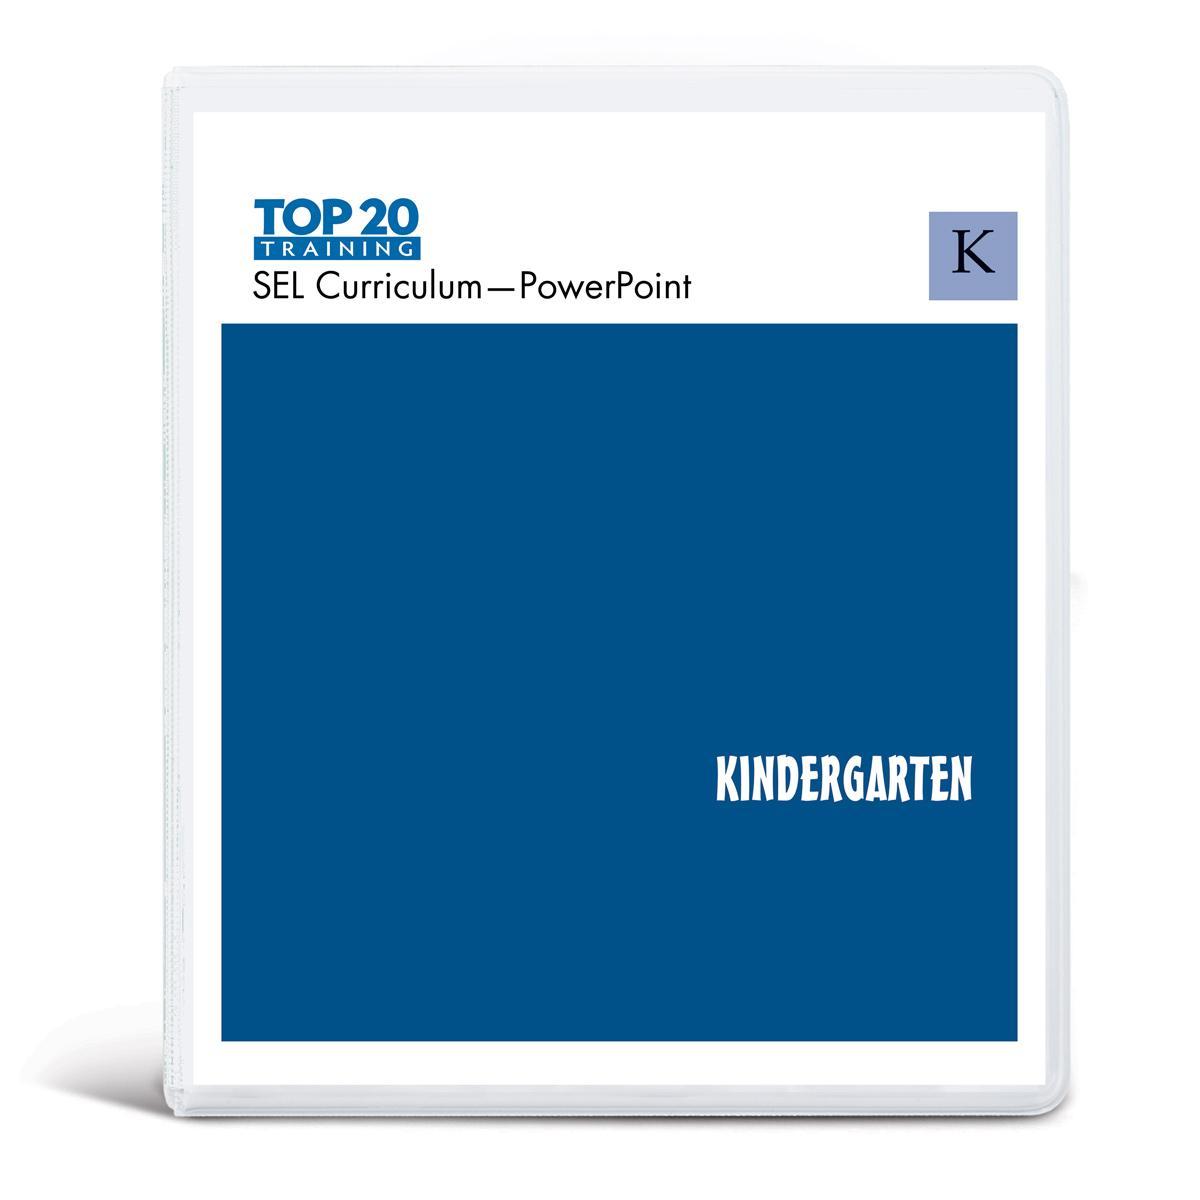 Top 20 teachers PowerPoint curriculum for kindergarten